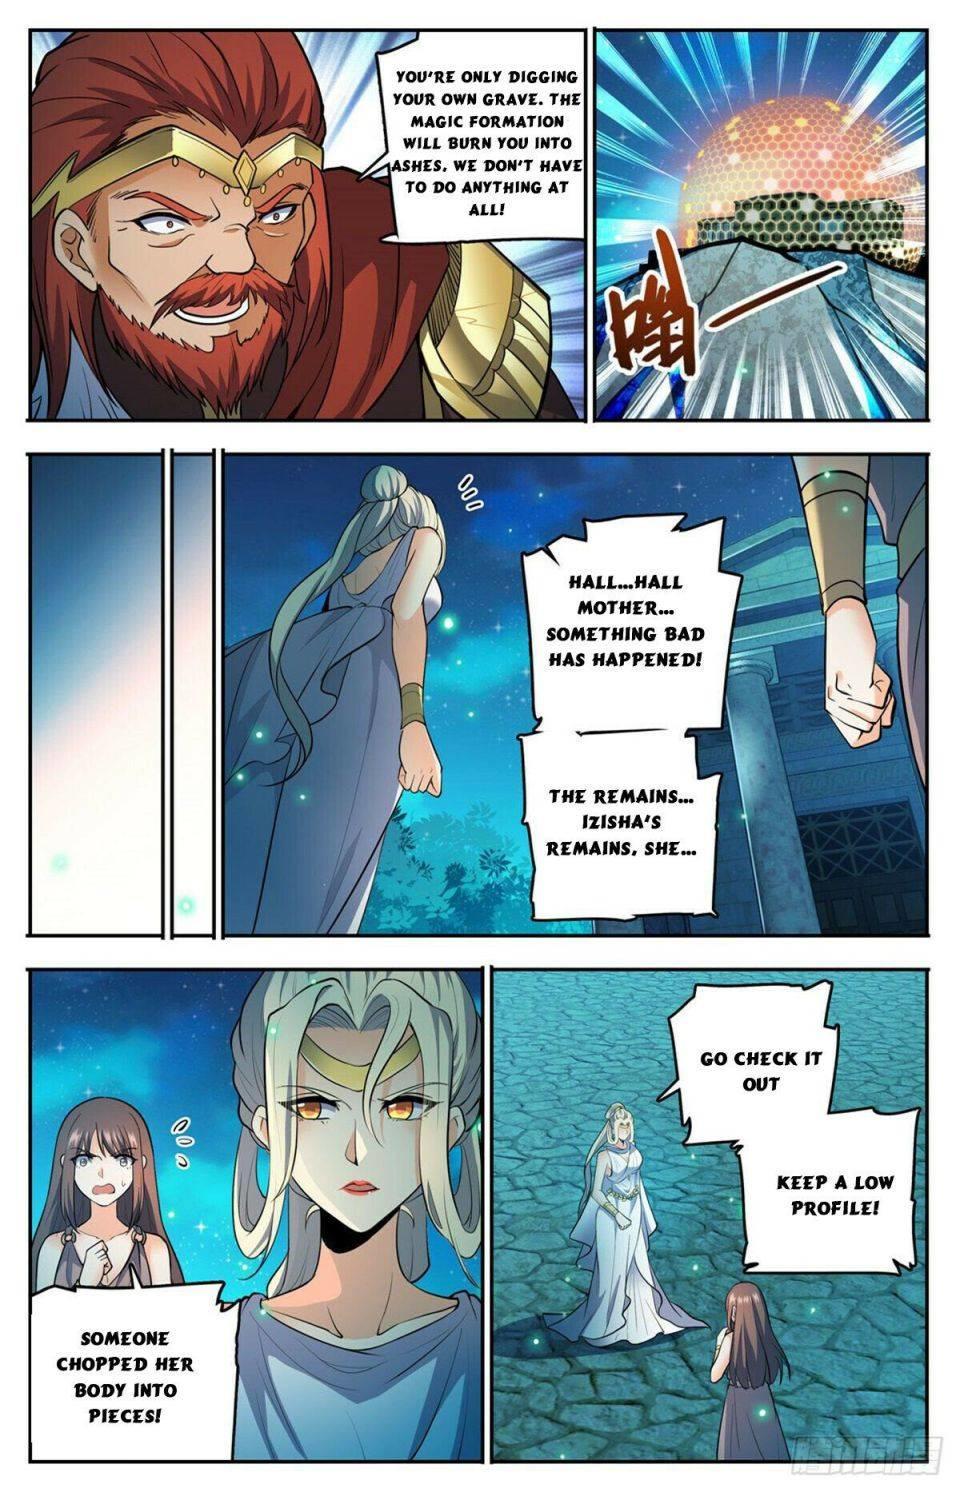 Versatile Mage Chapter 754 page 8 - Mangakakalot